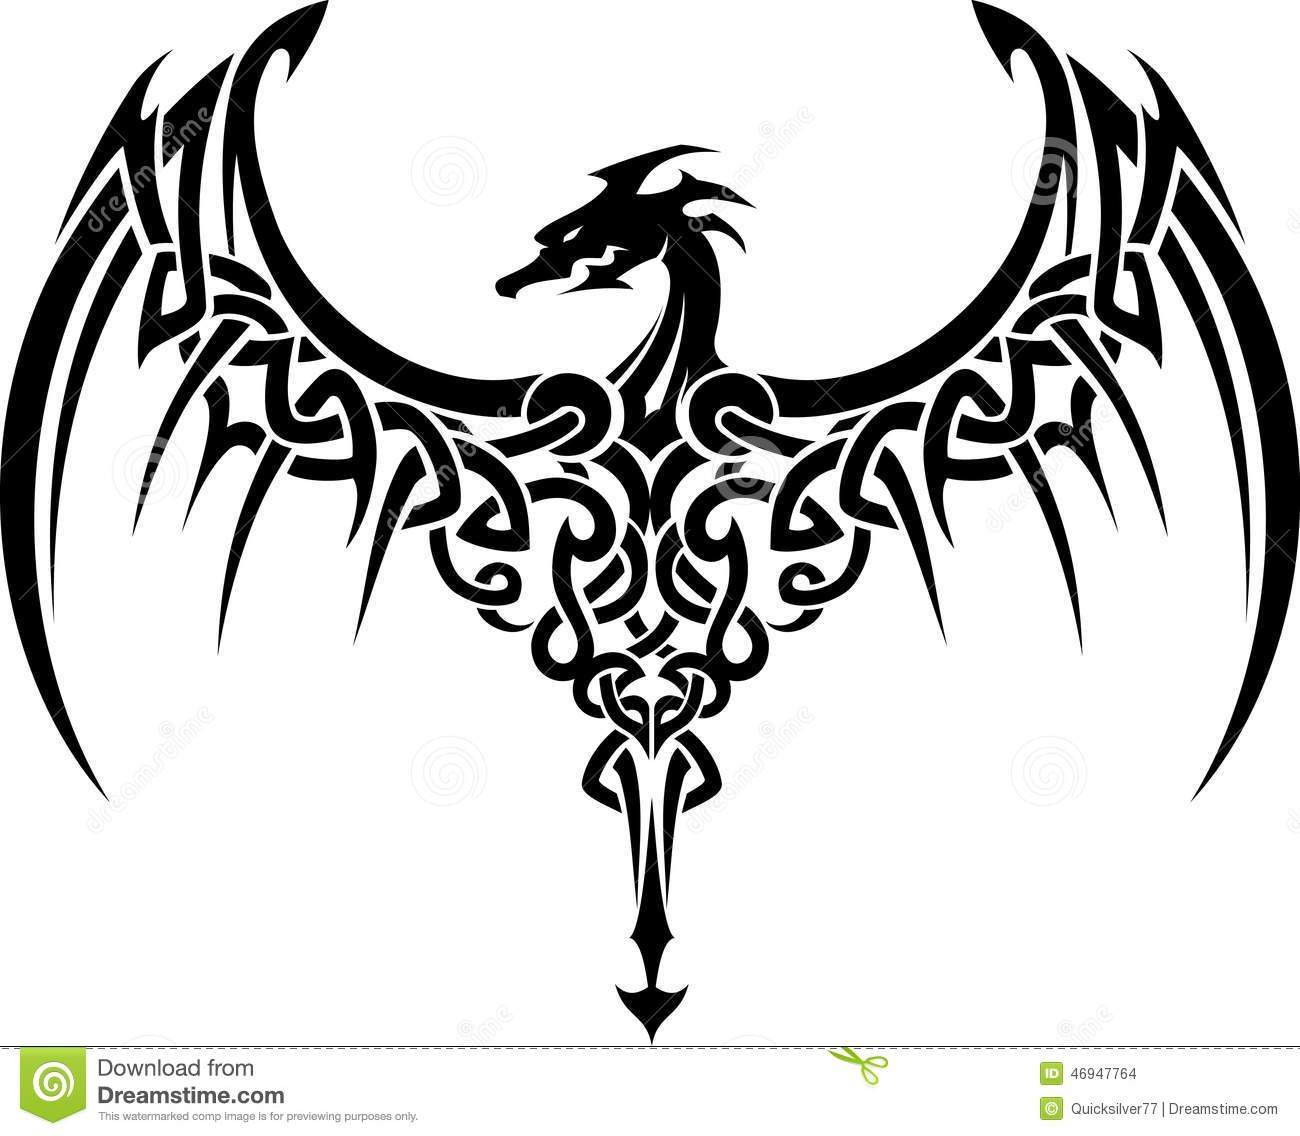 95ce59185dc54 Celtic Dragon Tattoo Stock Illustration - Image: 46947764 | DRAGONS ...